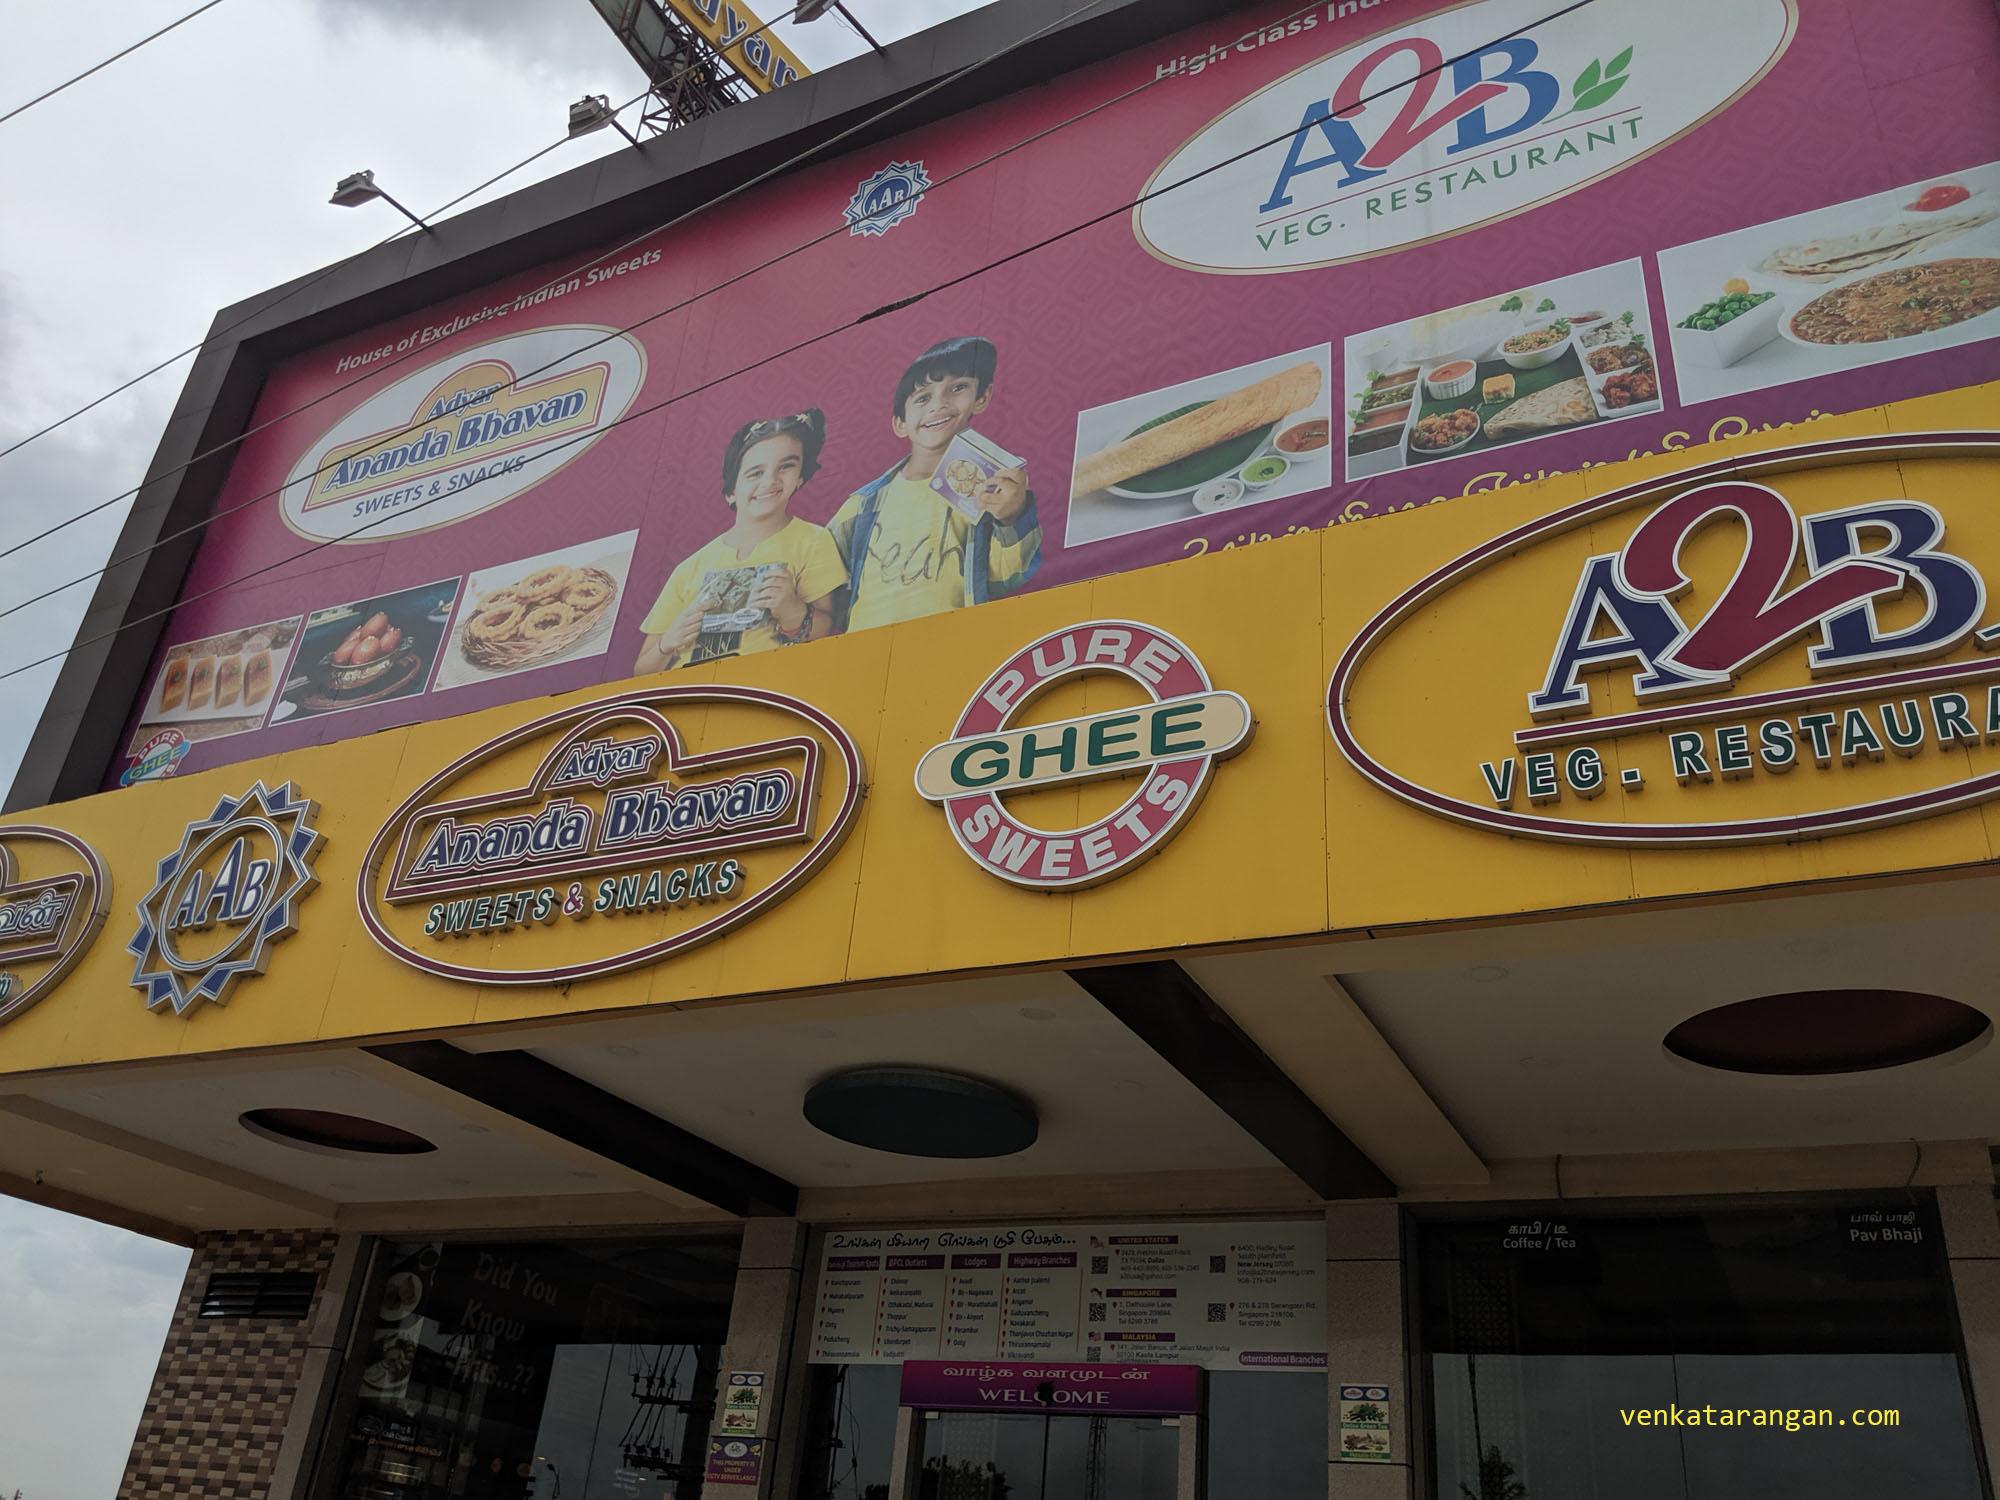 Adyar Ananda Bhavan (A2B) Vegetarian Restaurant, Buransemedu, near Arcot